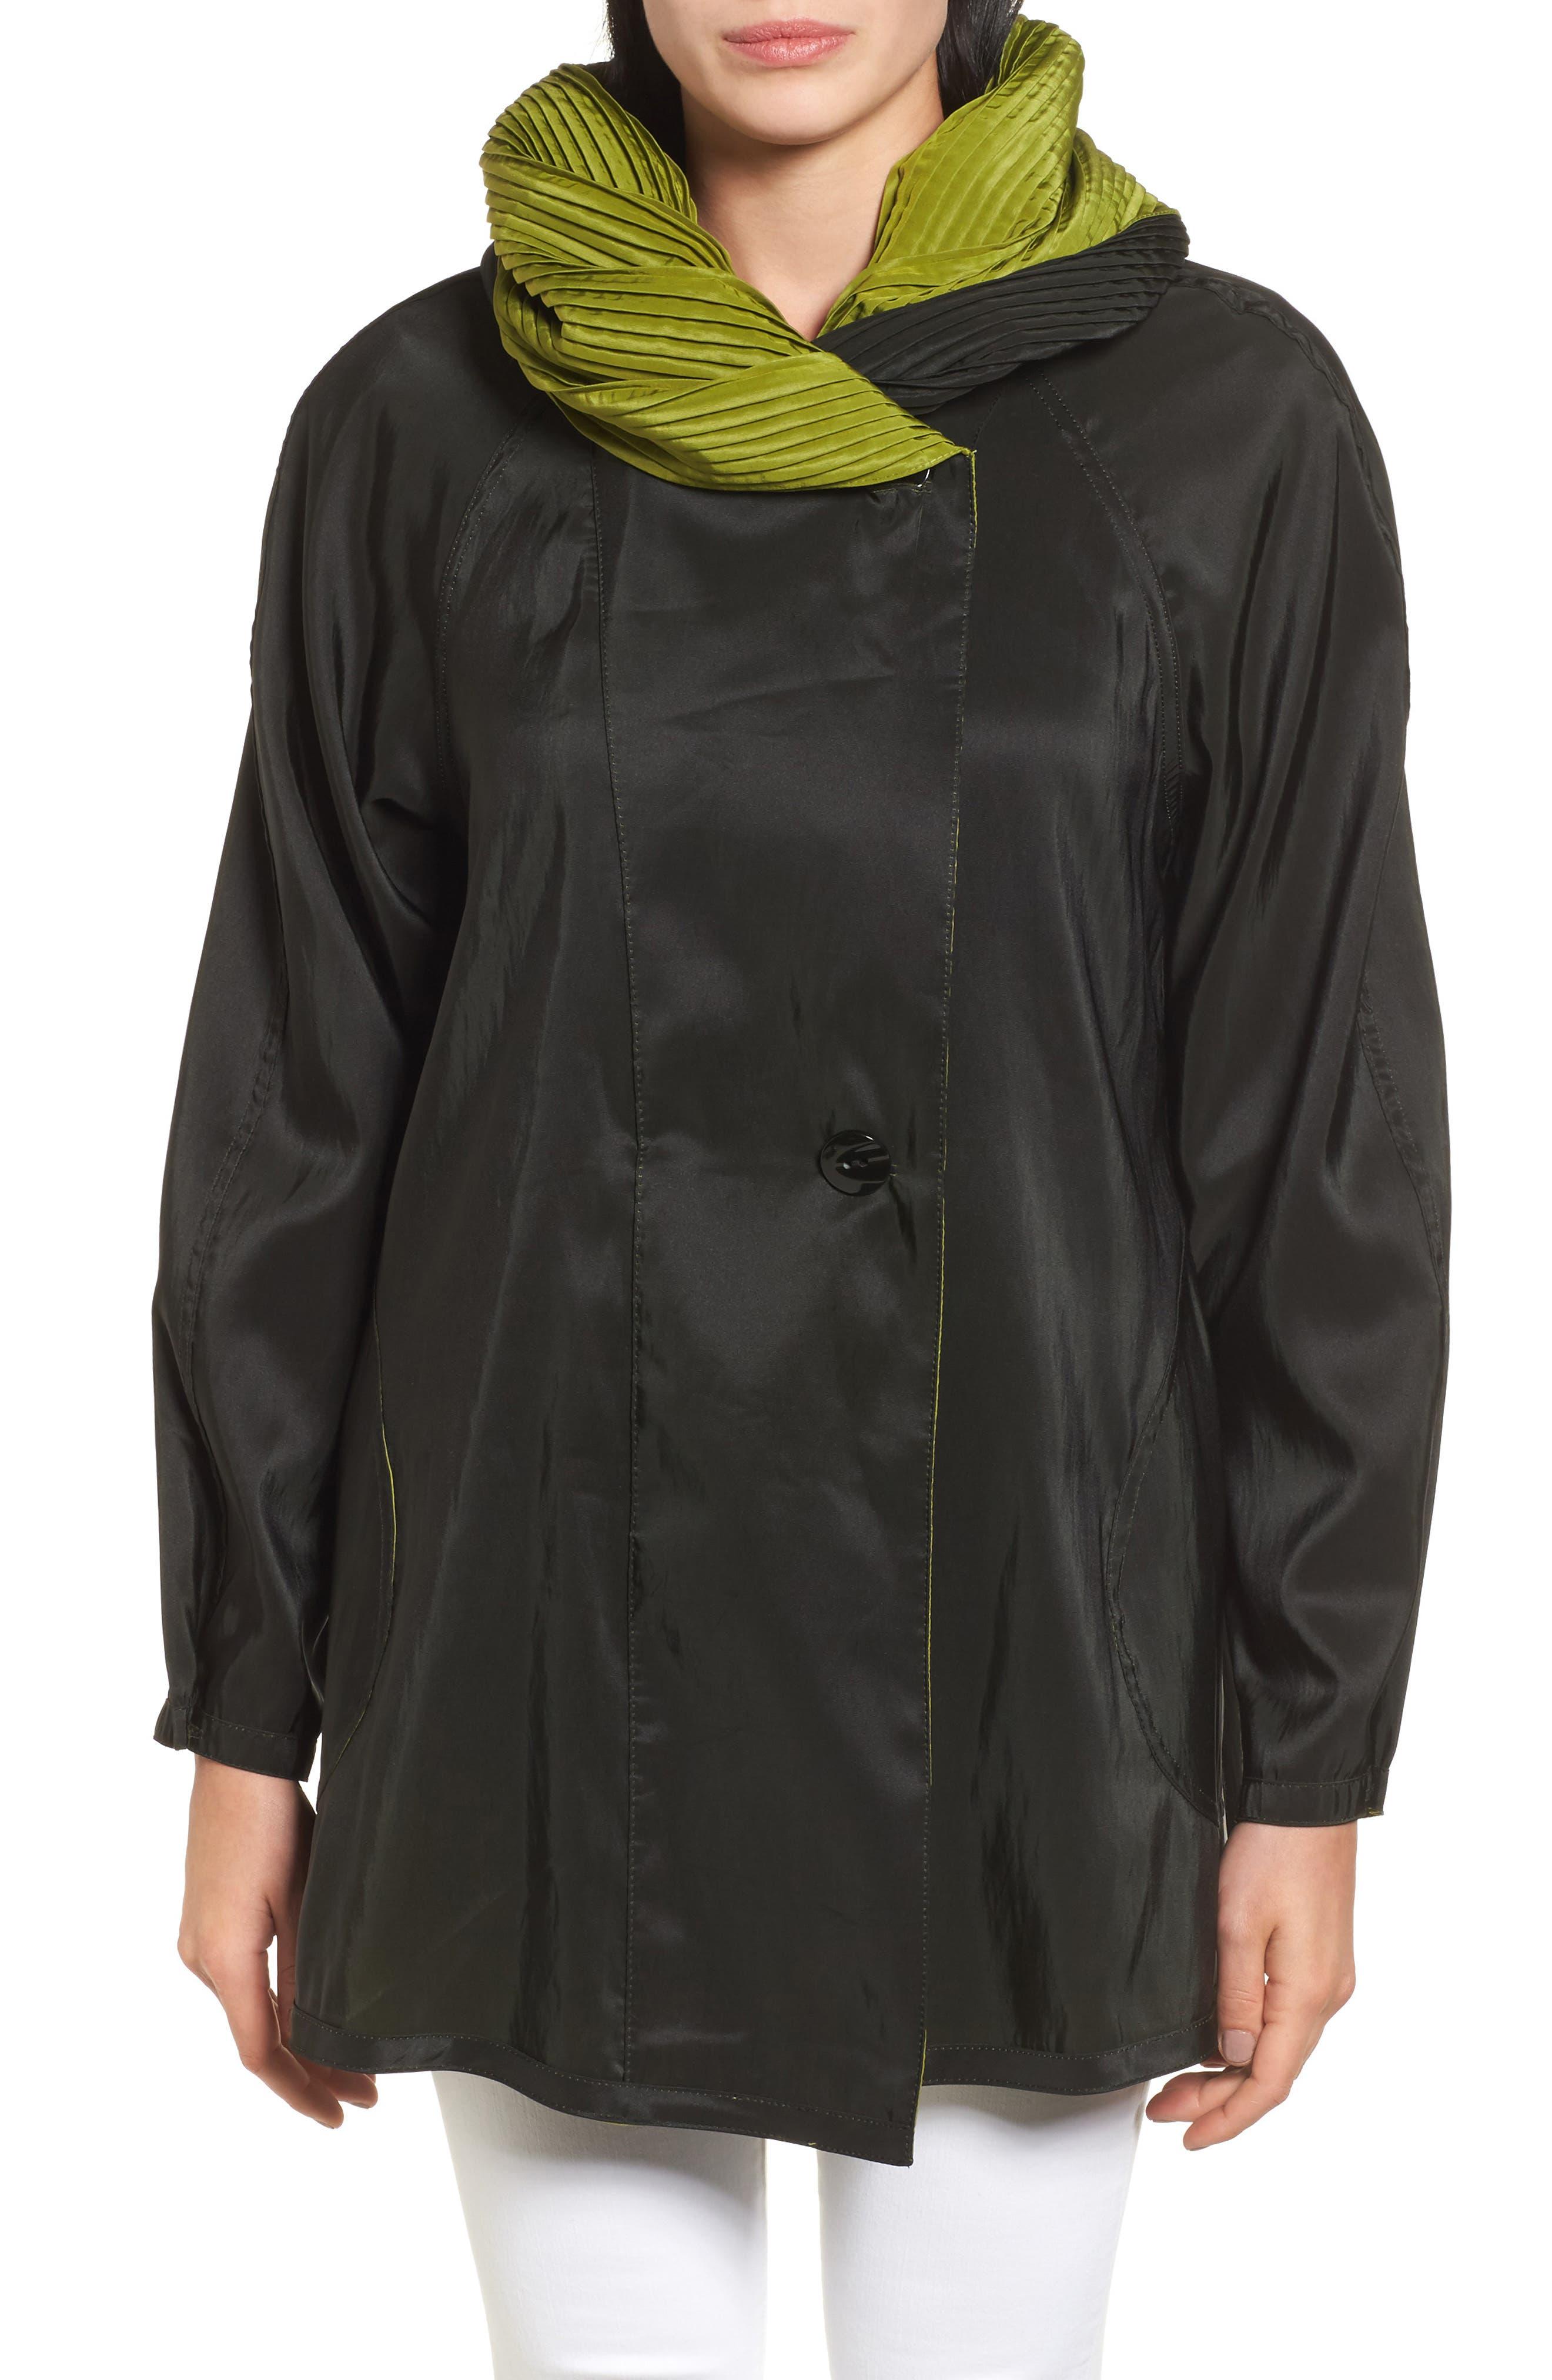 'Mini Donatella' Reversible Pleat Hood Packable Travel Coat,                             Alternate thumbnail 4, color,                             316